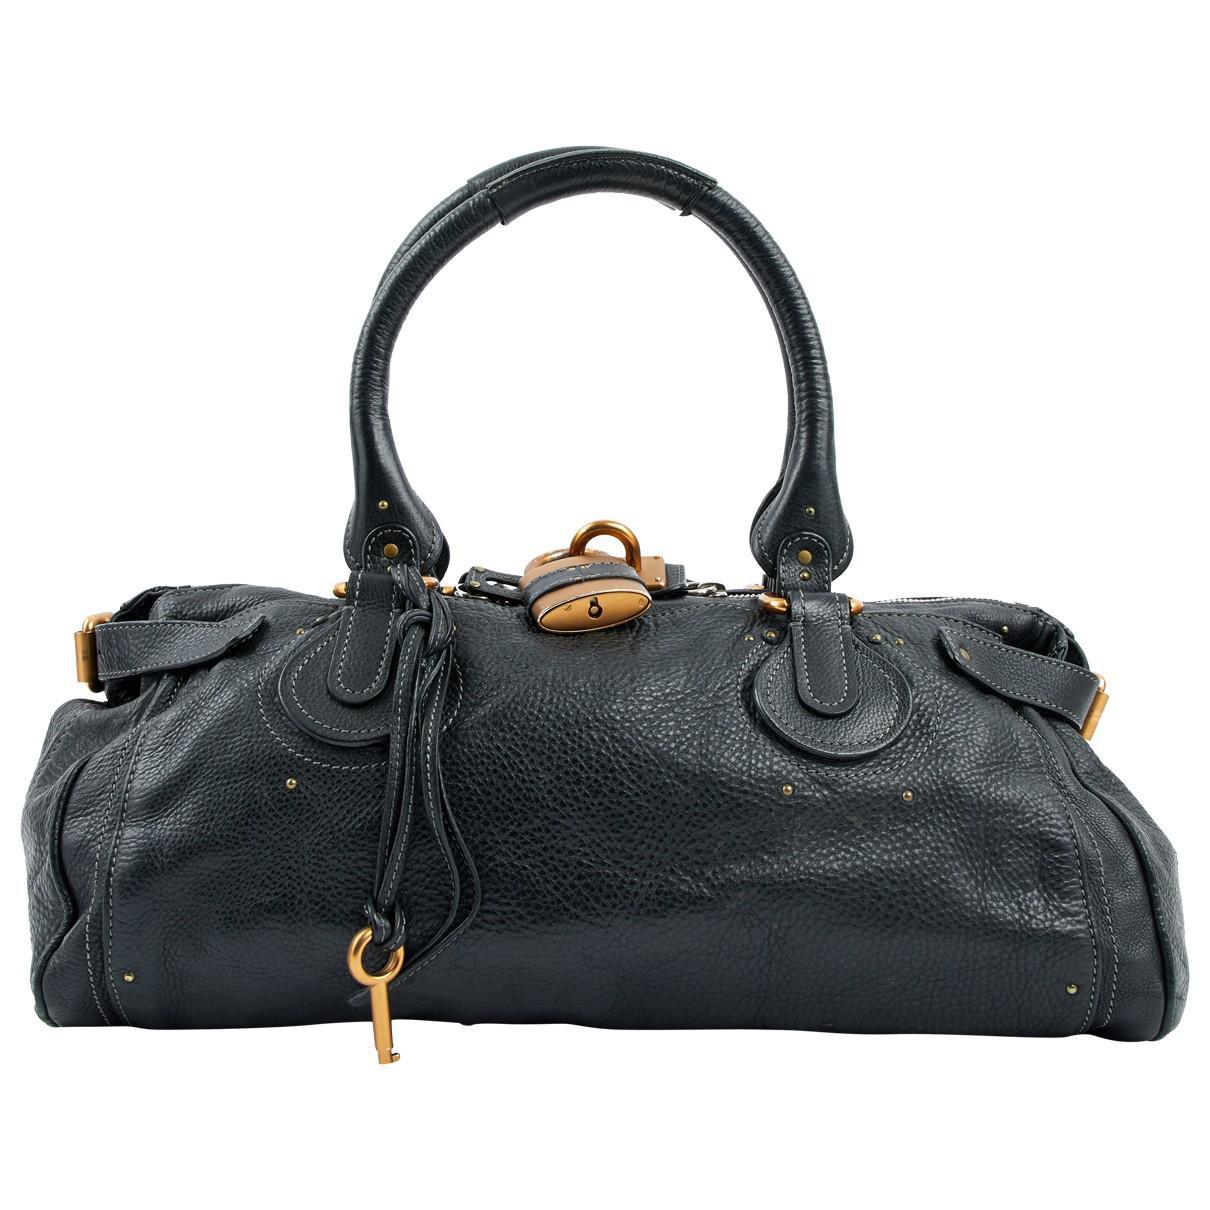 Pre-owned - Paddington leather bag Chloé Buy Cheap Sast EmVcVK